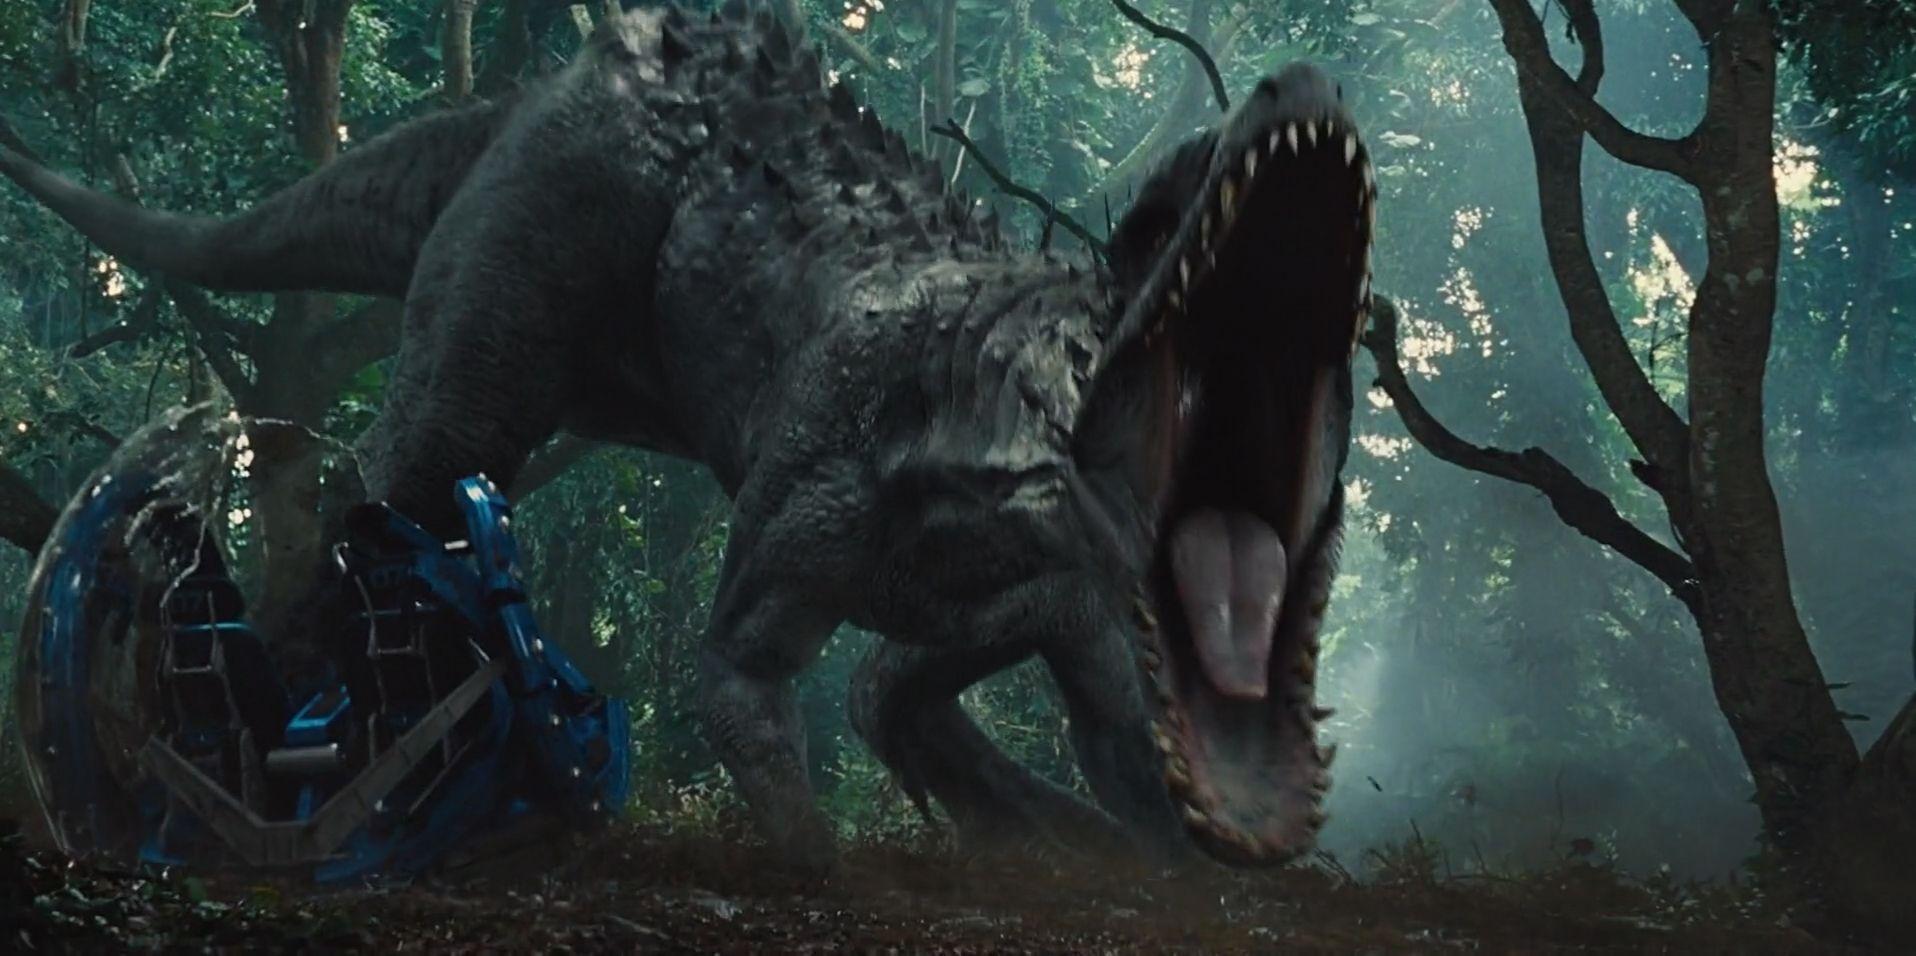 Pin on Jurassic park